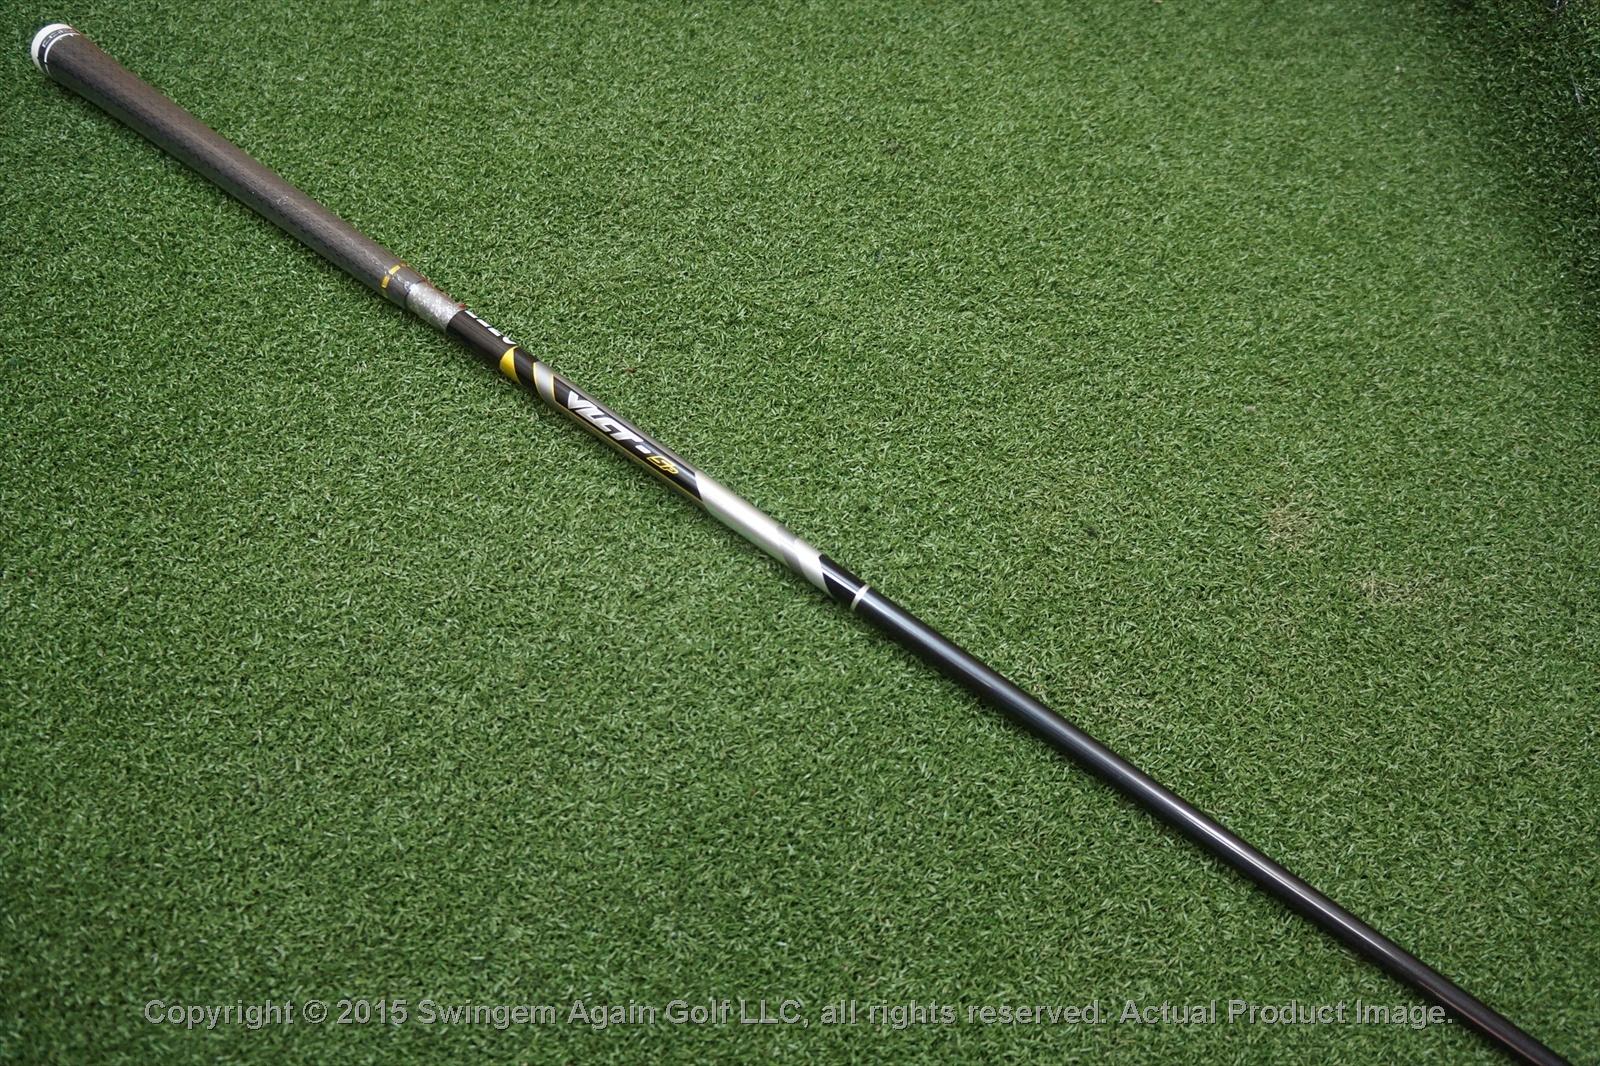 Cobra Matrix Vlct Sp Fly Z 3 4 Wood Stiff Flex Shaft Pull